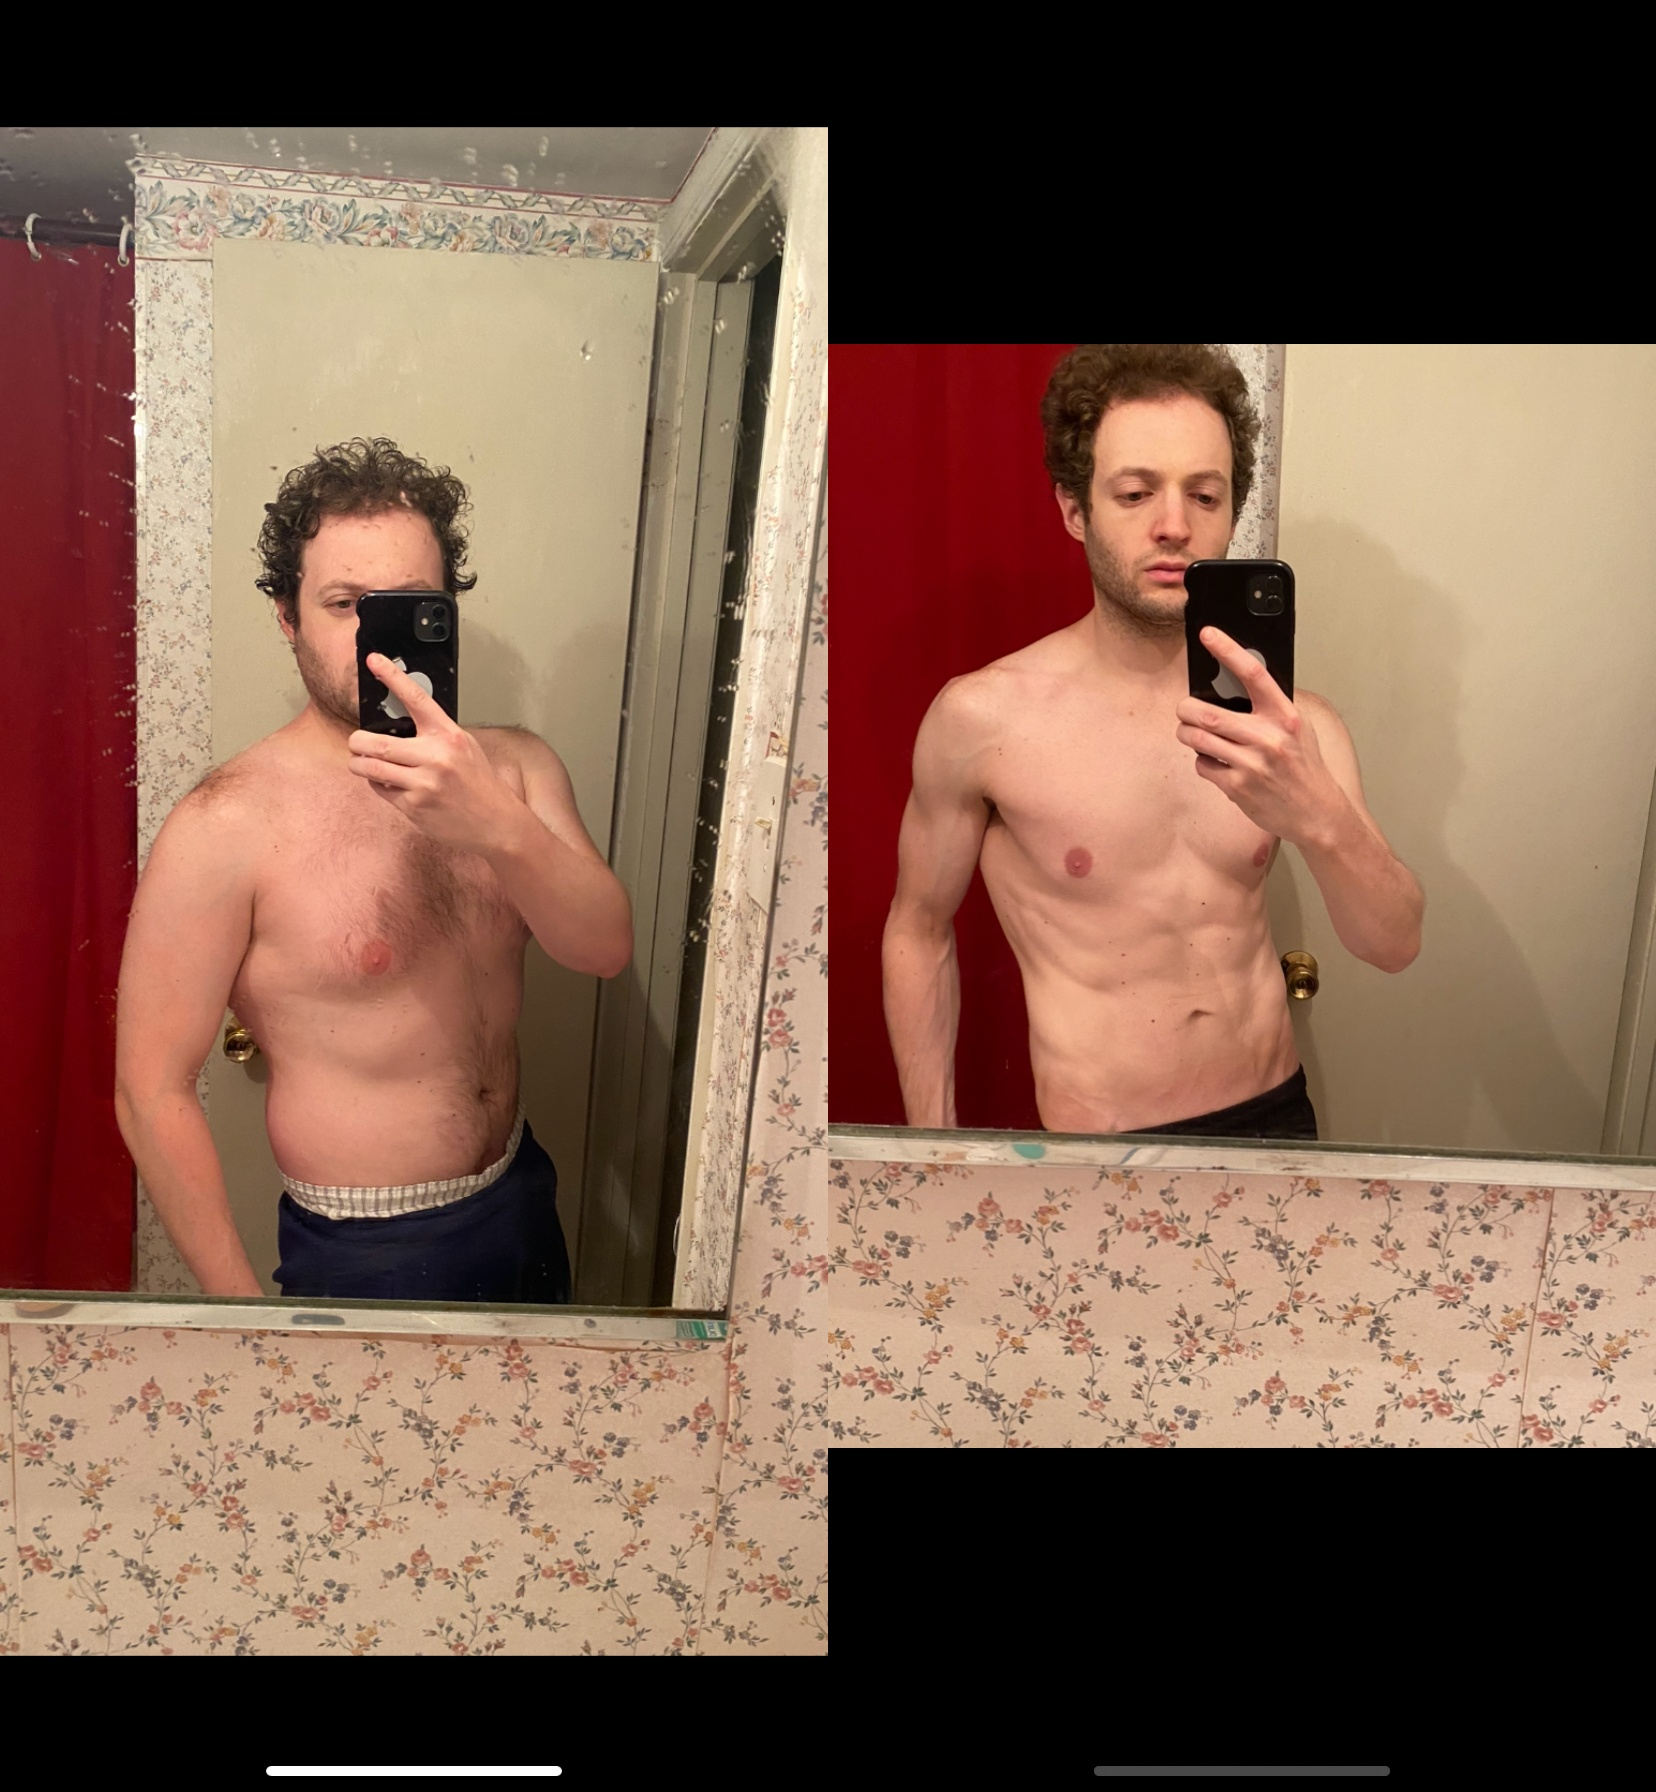 5 feet 8 Male Progress Pics of 44 lbs Weight Loss 192 lbs to 148 lbs